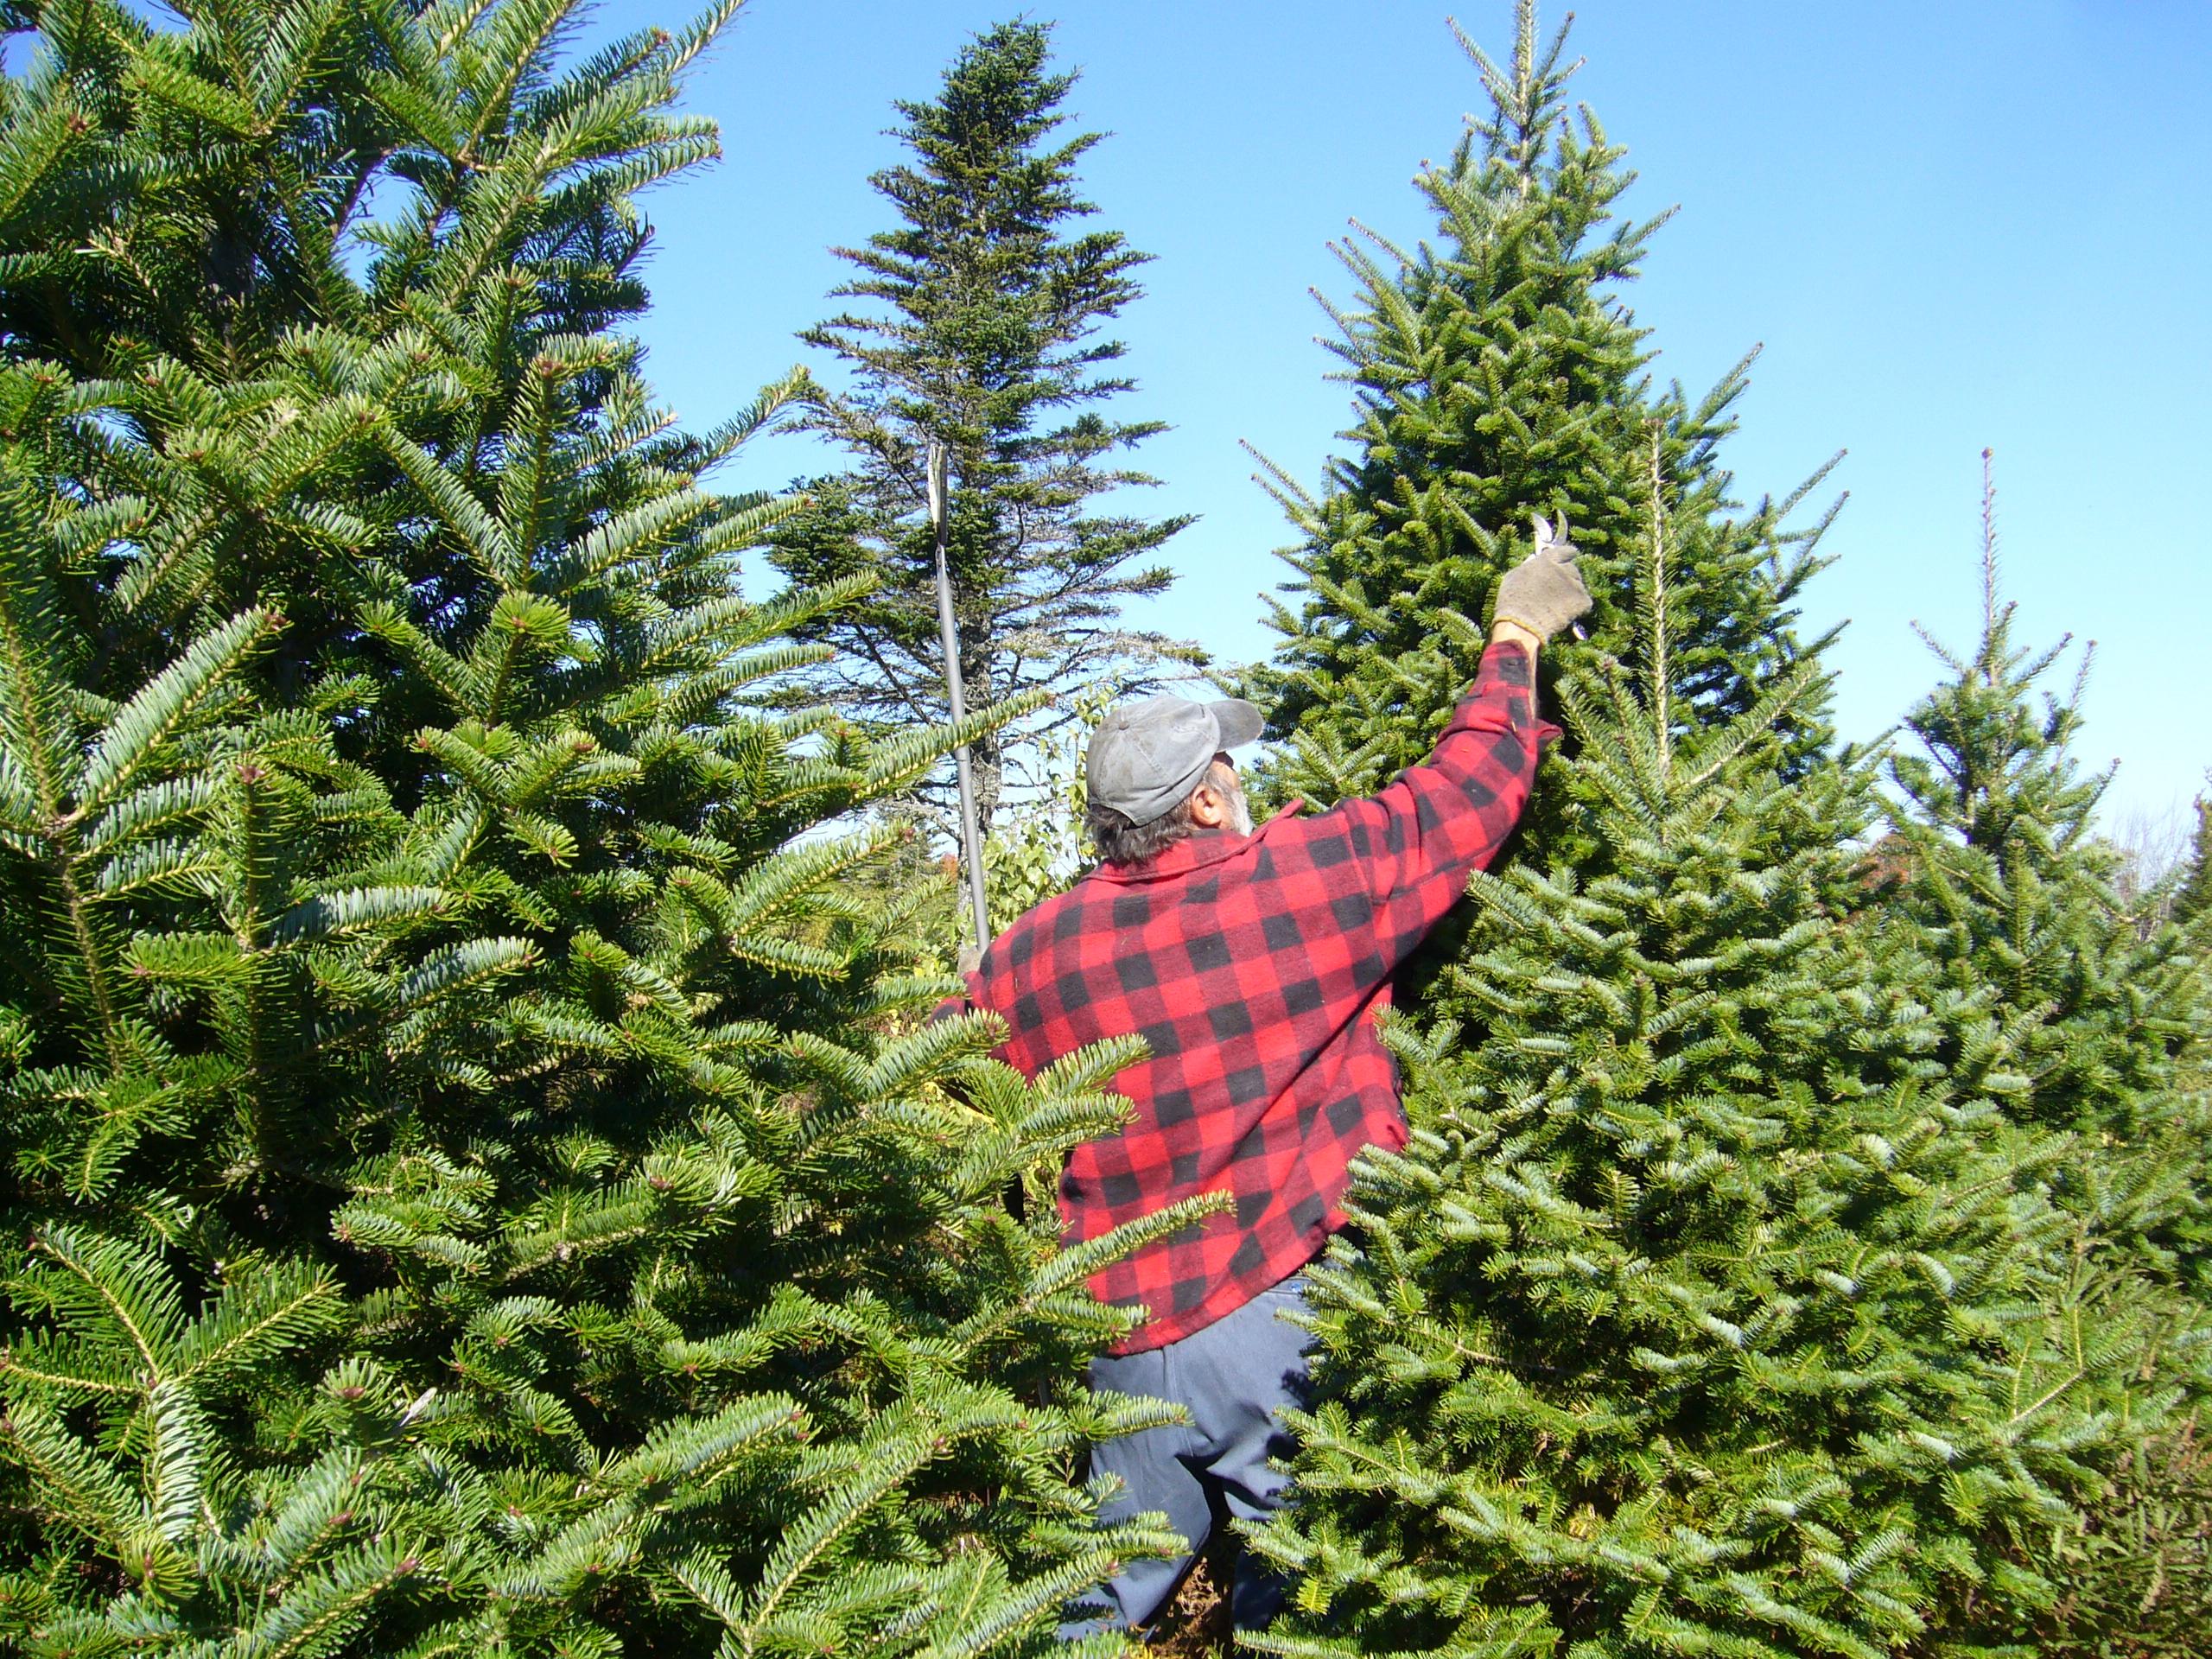 (c) Rcbutcher on wikipedia. Depicts Christmas tree farmer tending to trees in Waterloo, Nova Scotia.